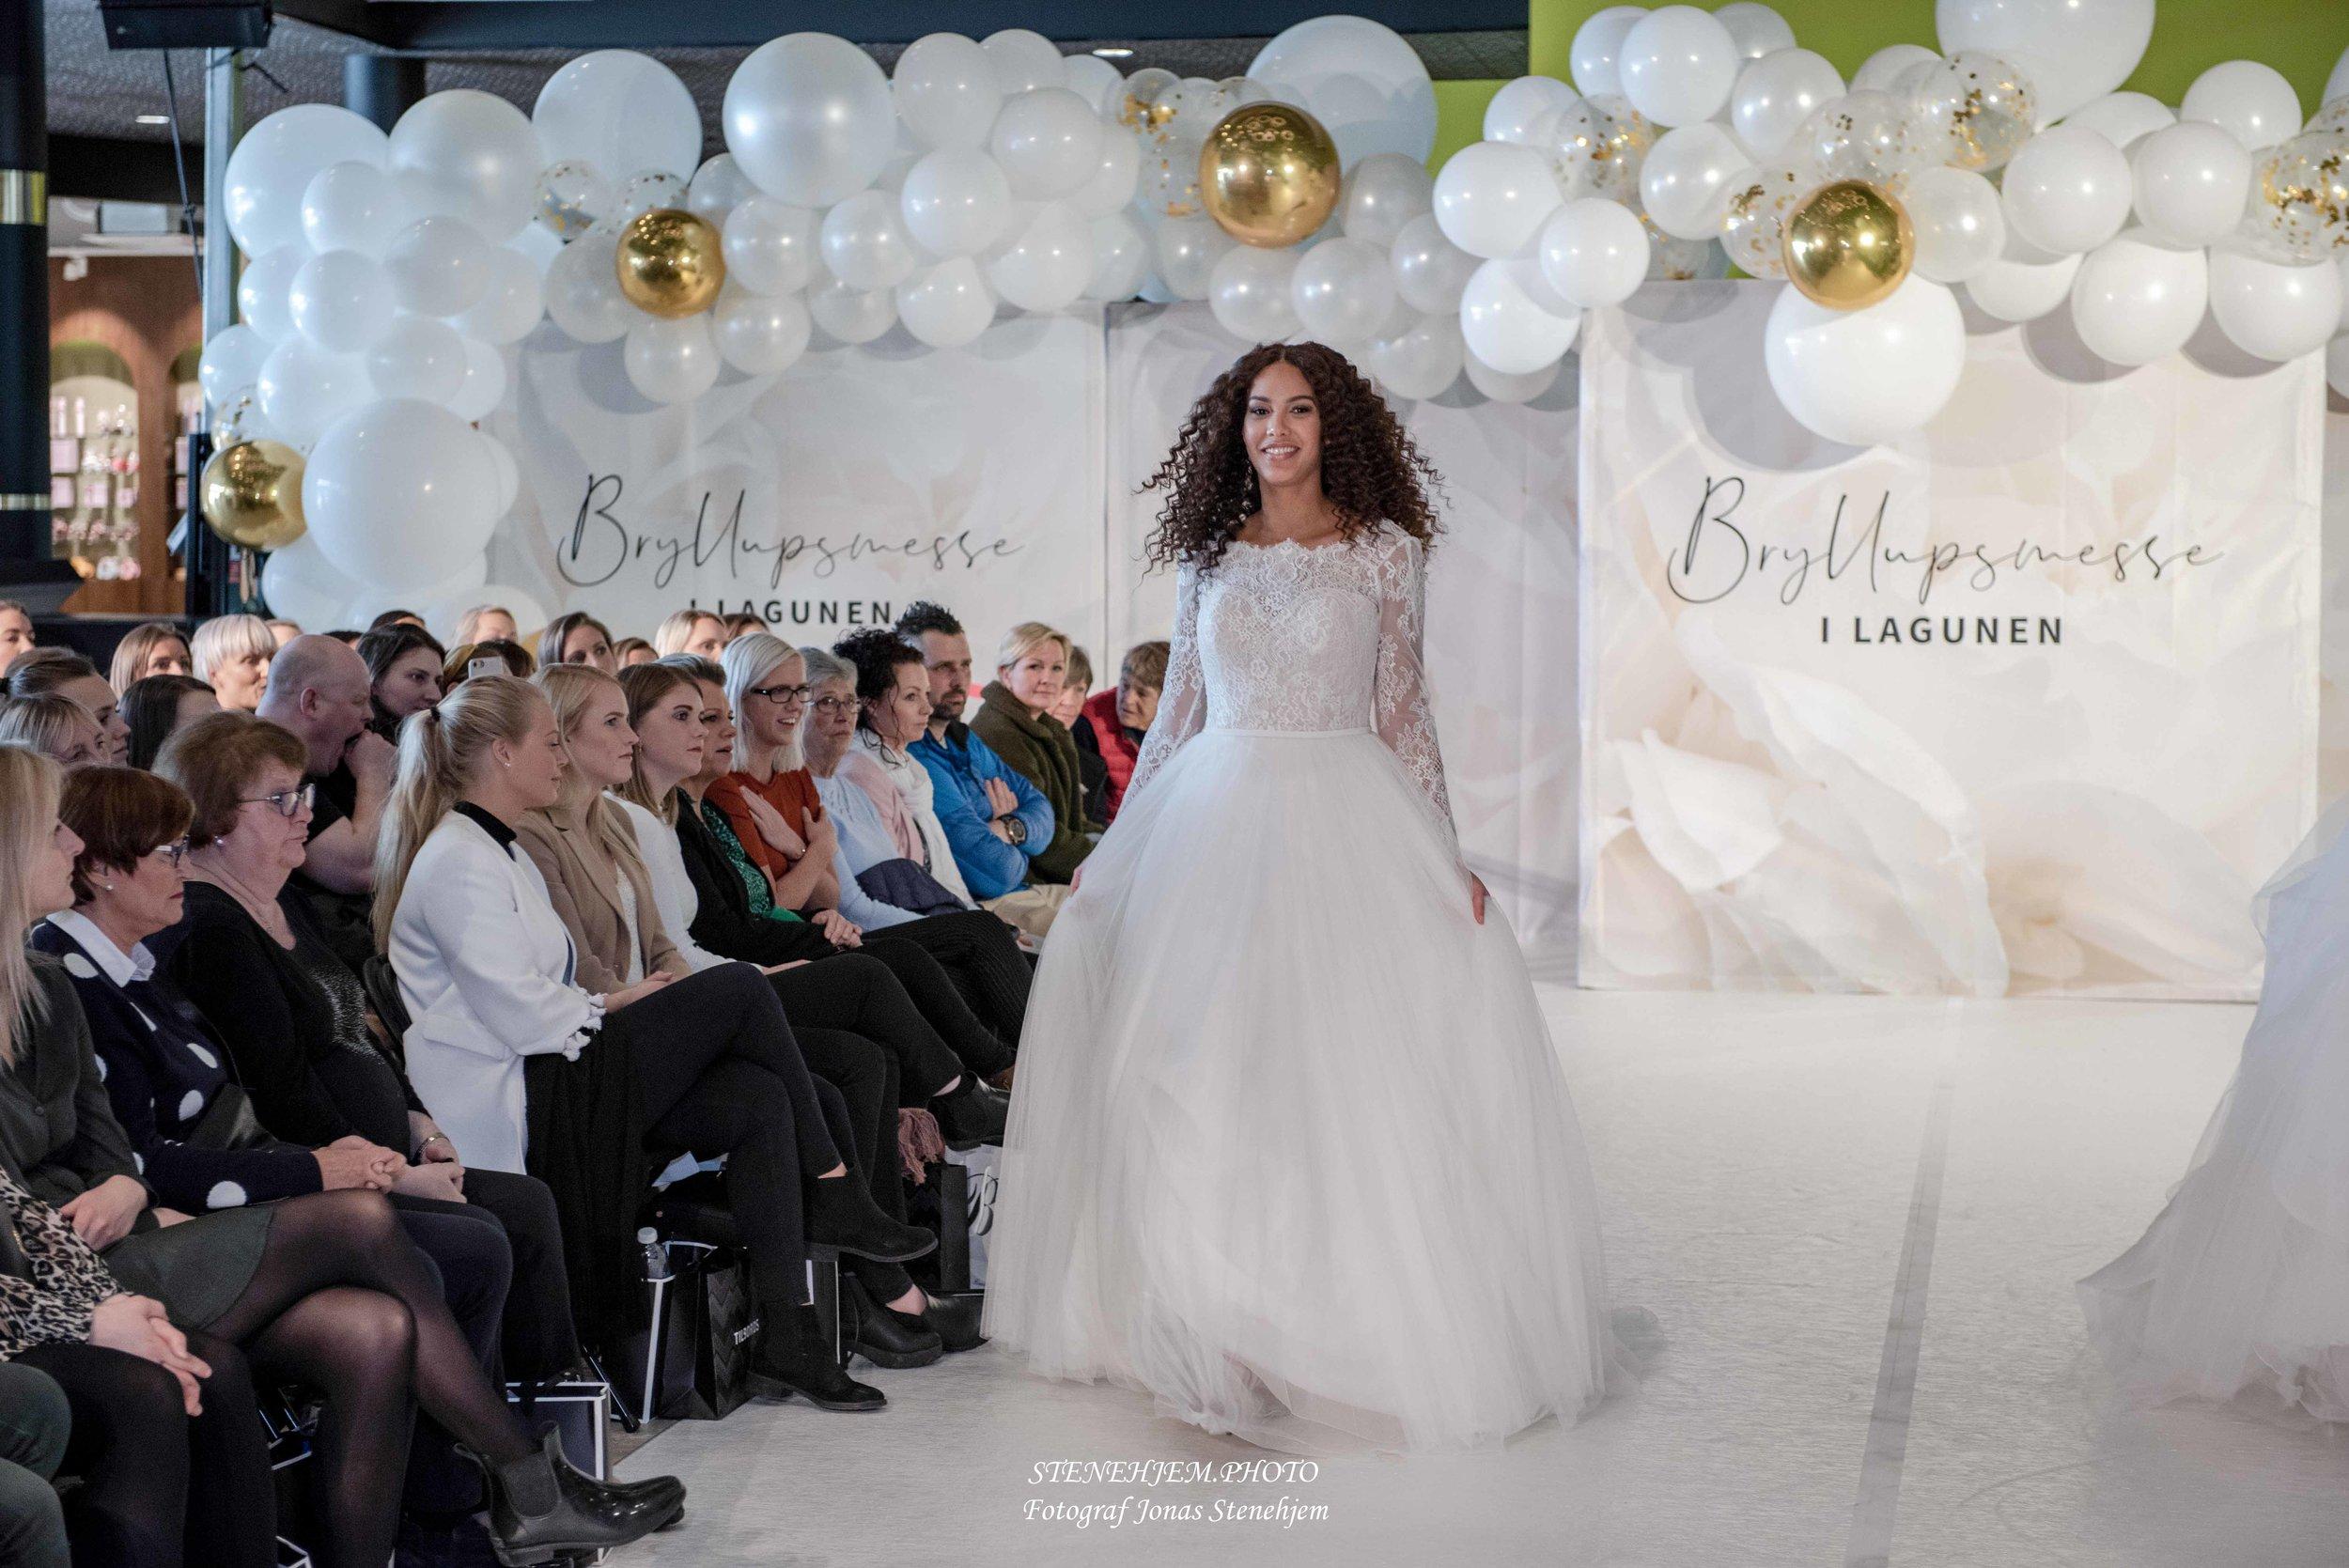 Bryllupsmesse_Lagunen_mittaltweddingfair__090.jpg